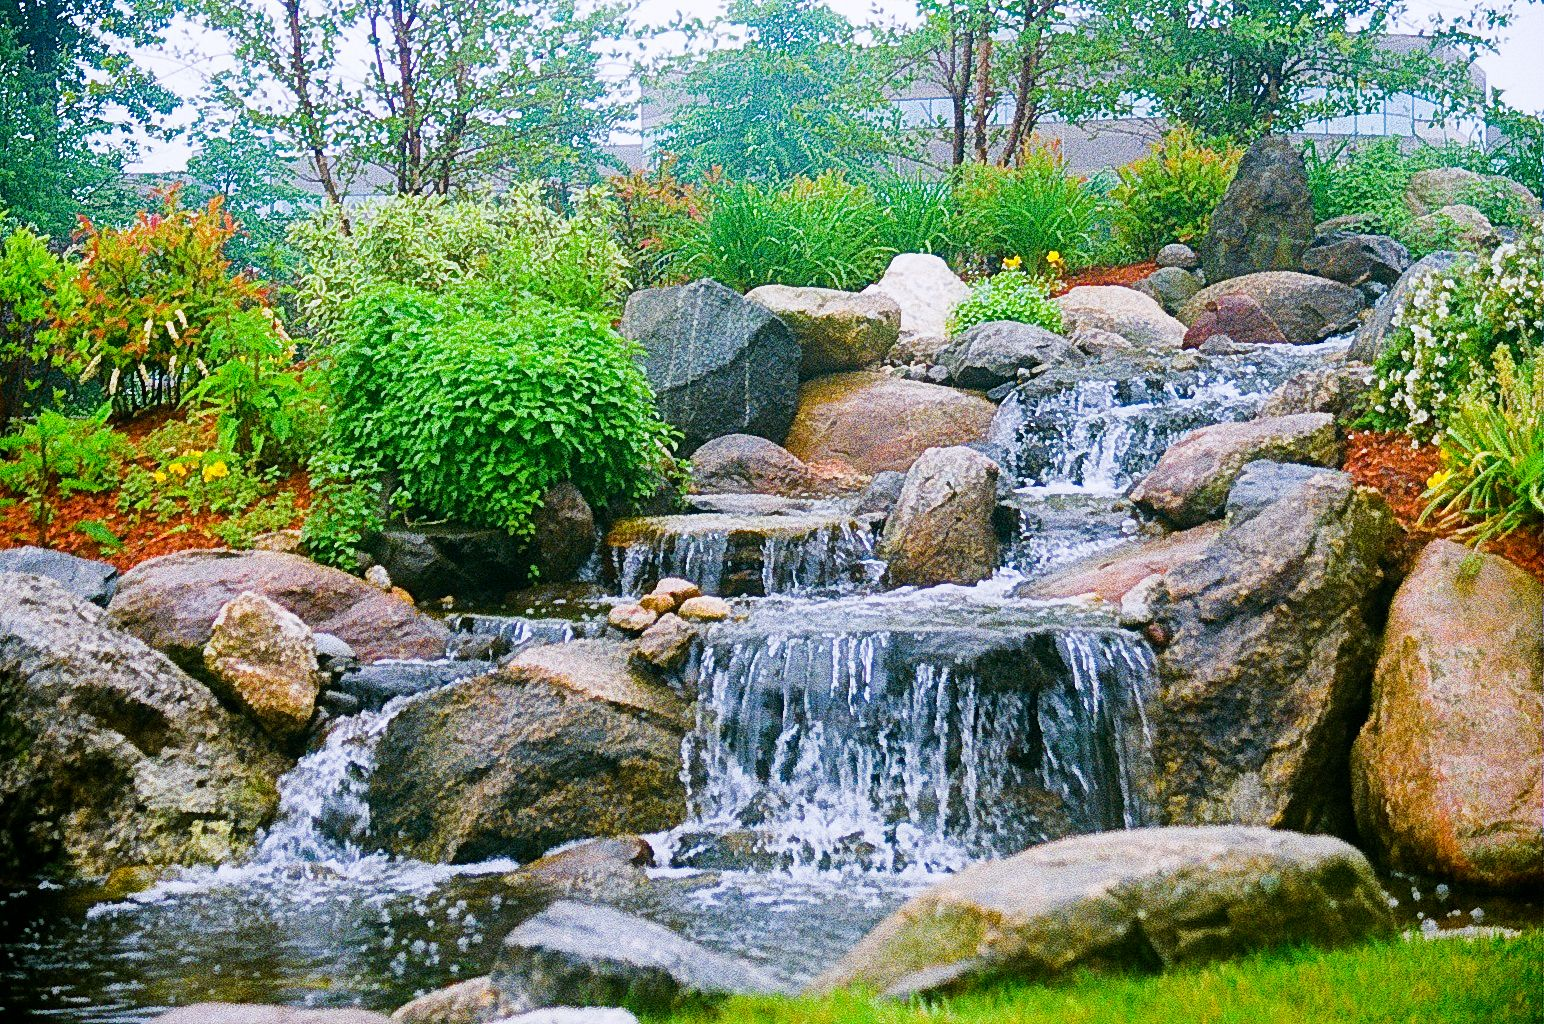 50 Inspiring Ideas Backyard Ponds and Water Gardens (37 ...